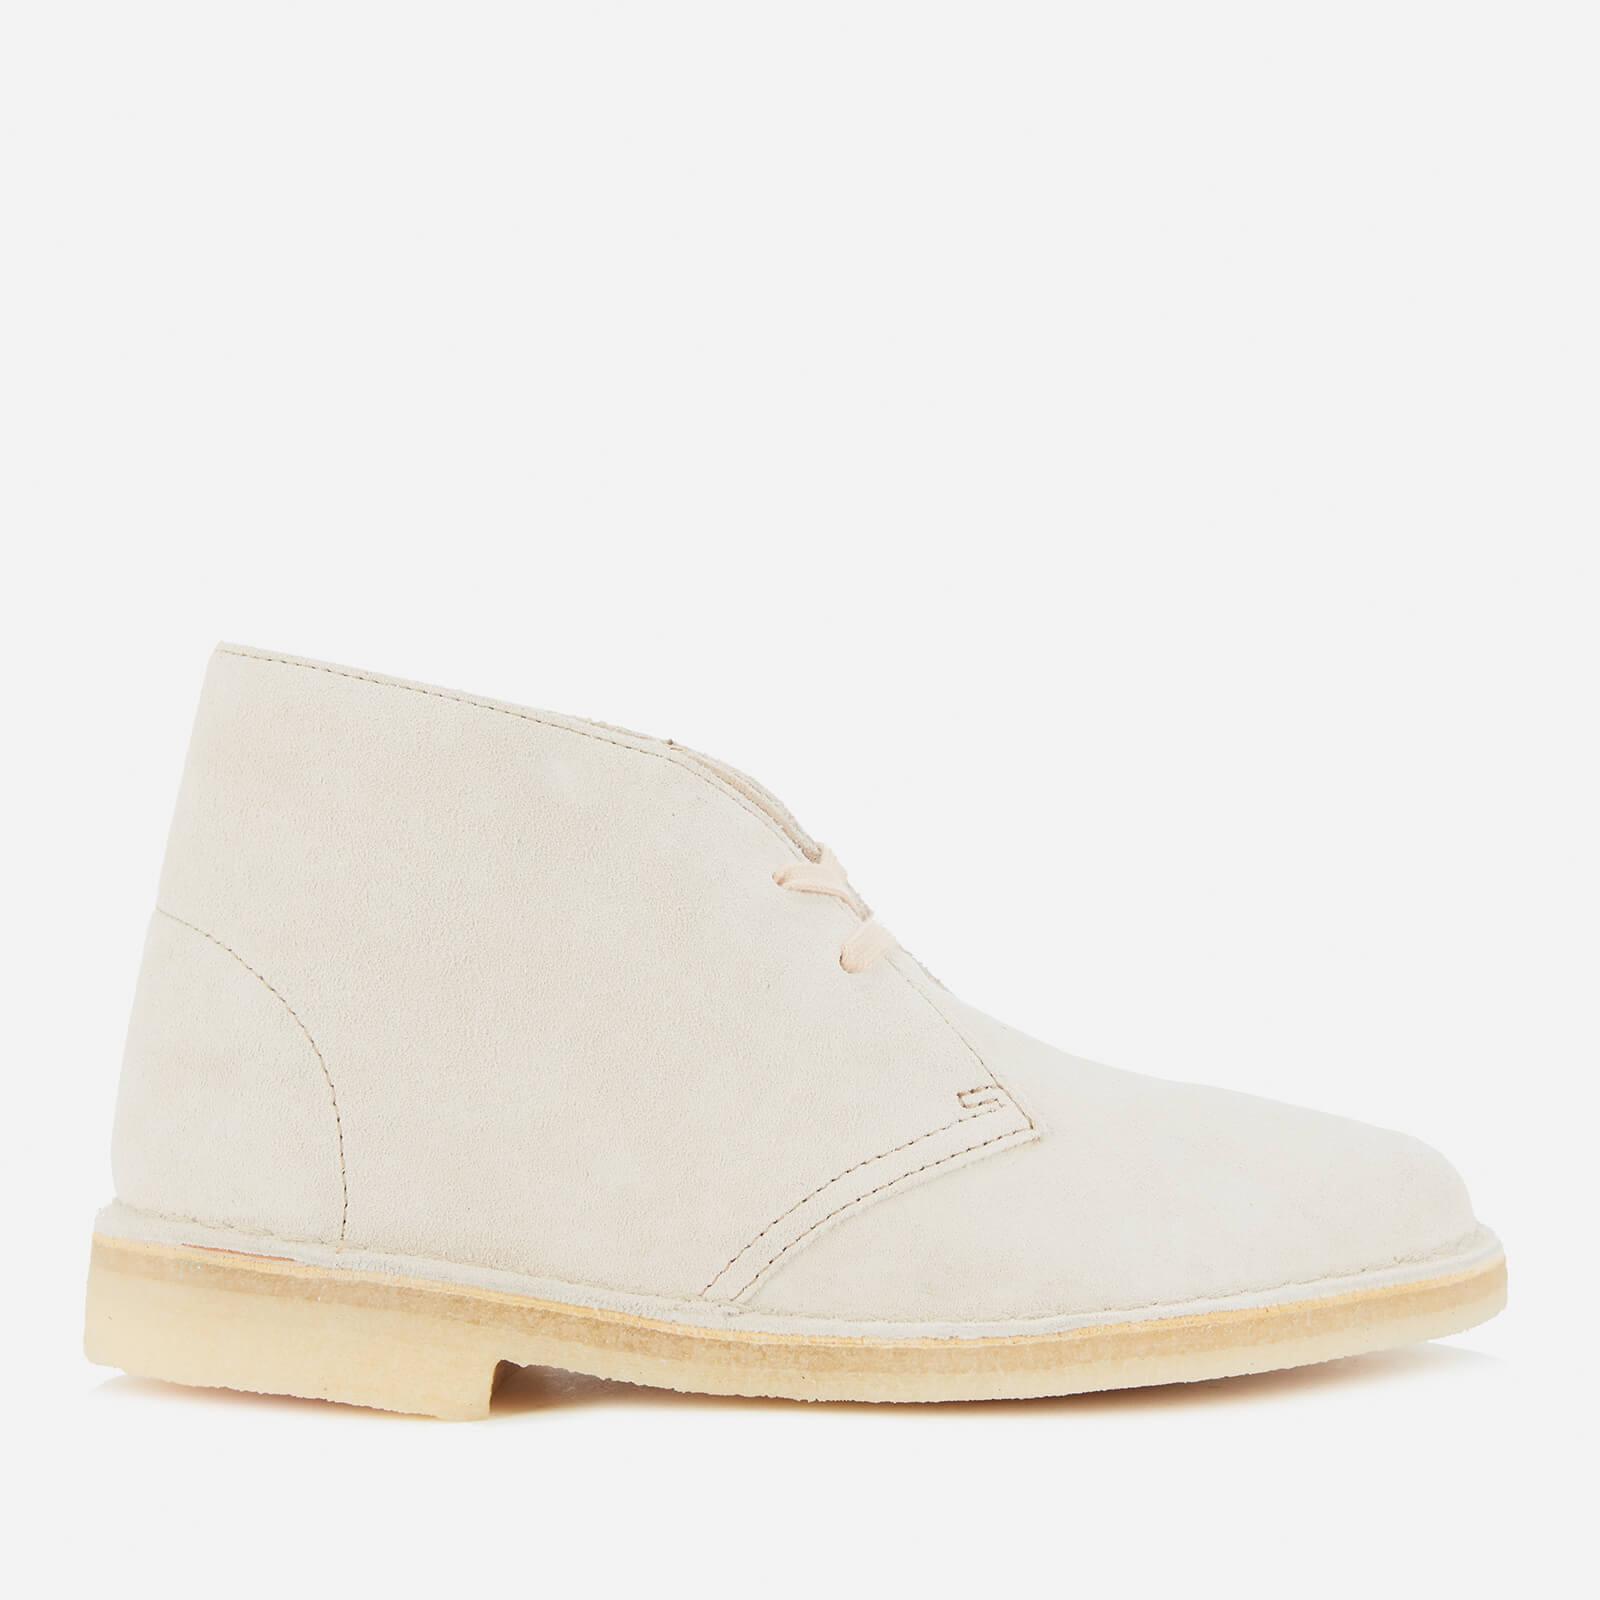 Clarks Original Women's Suede Desert Boots - Off White - Uk 4